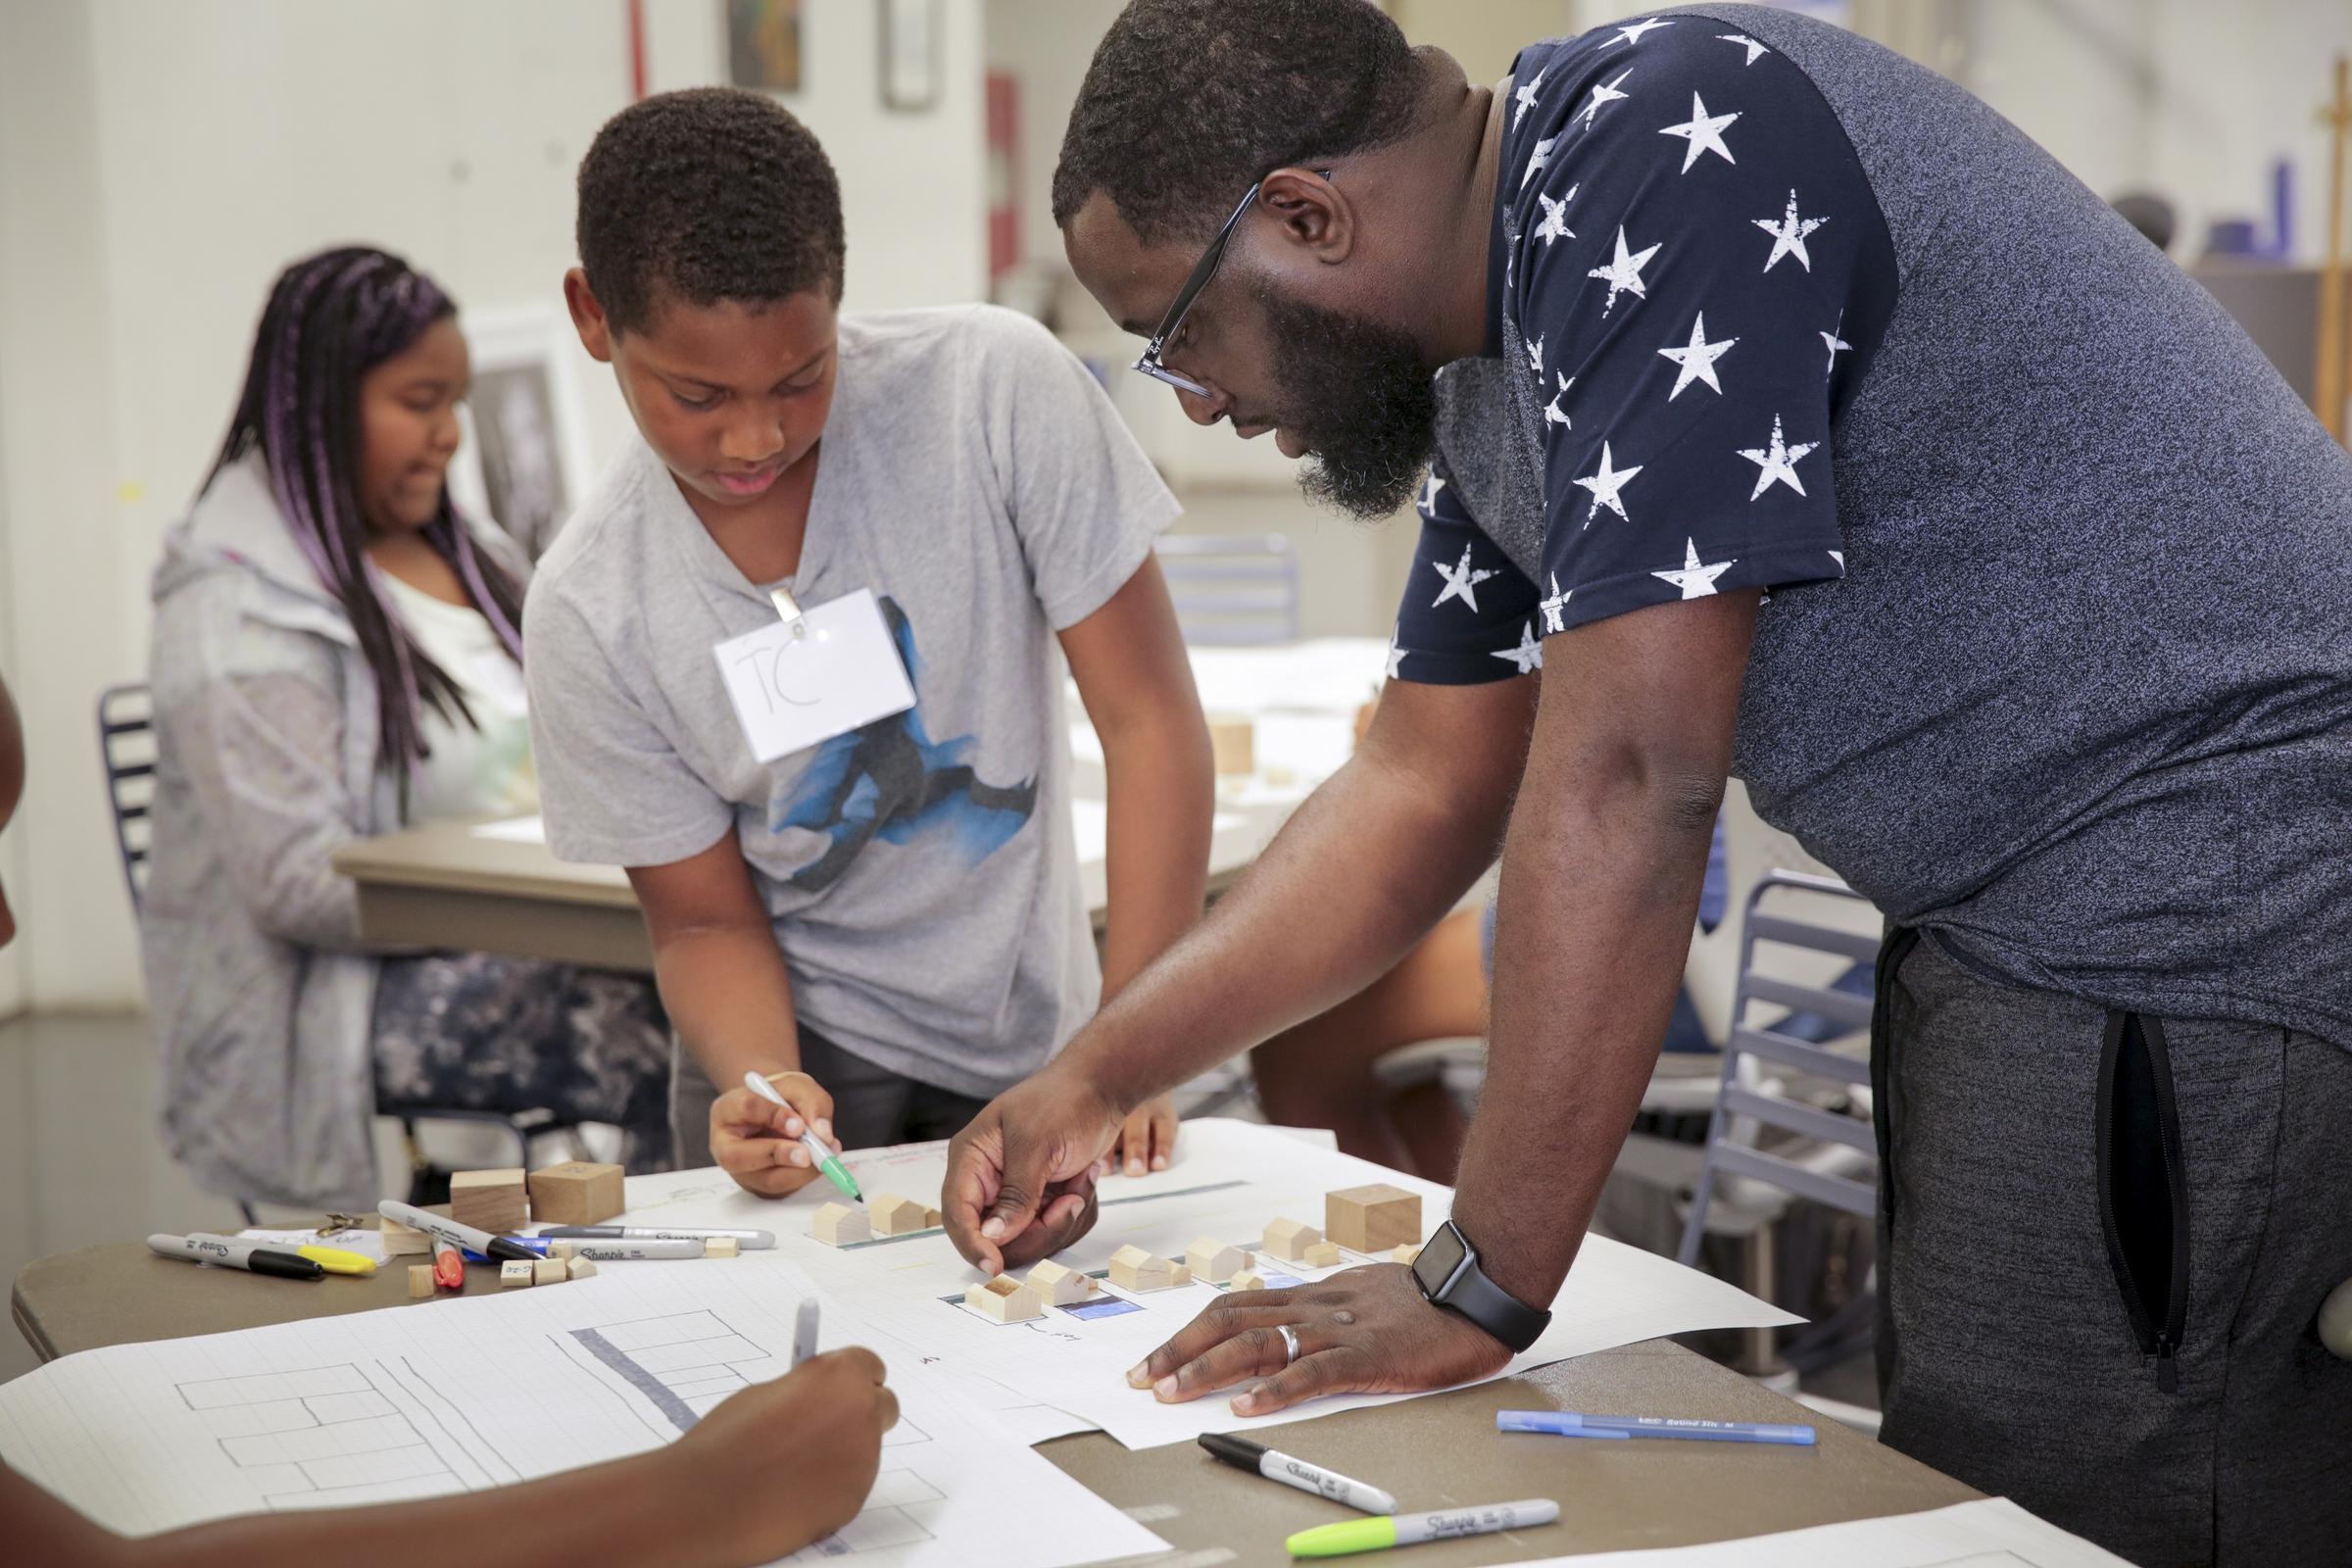 CREATIVE ECO - Creative career institute for future creative pros.Learn more ➝